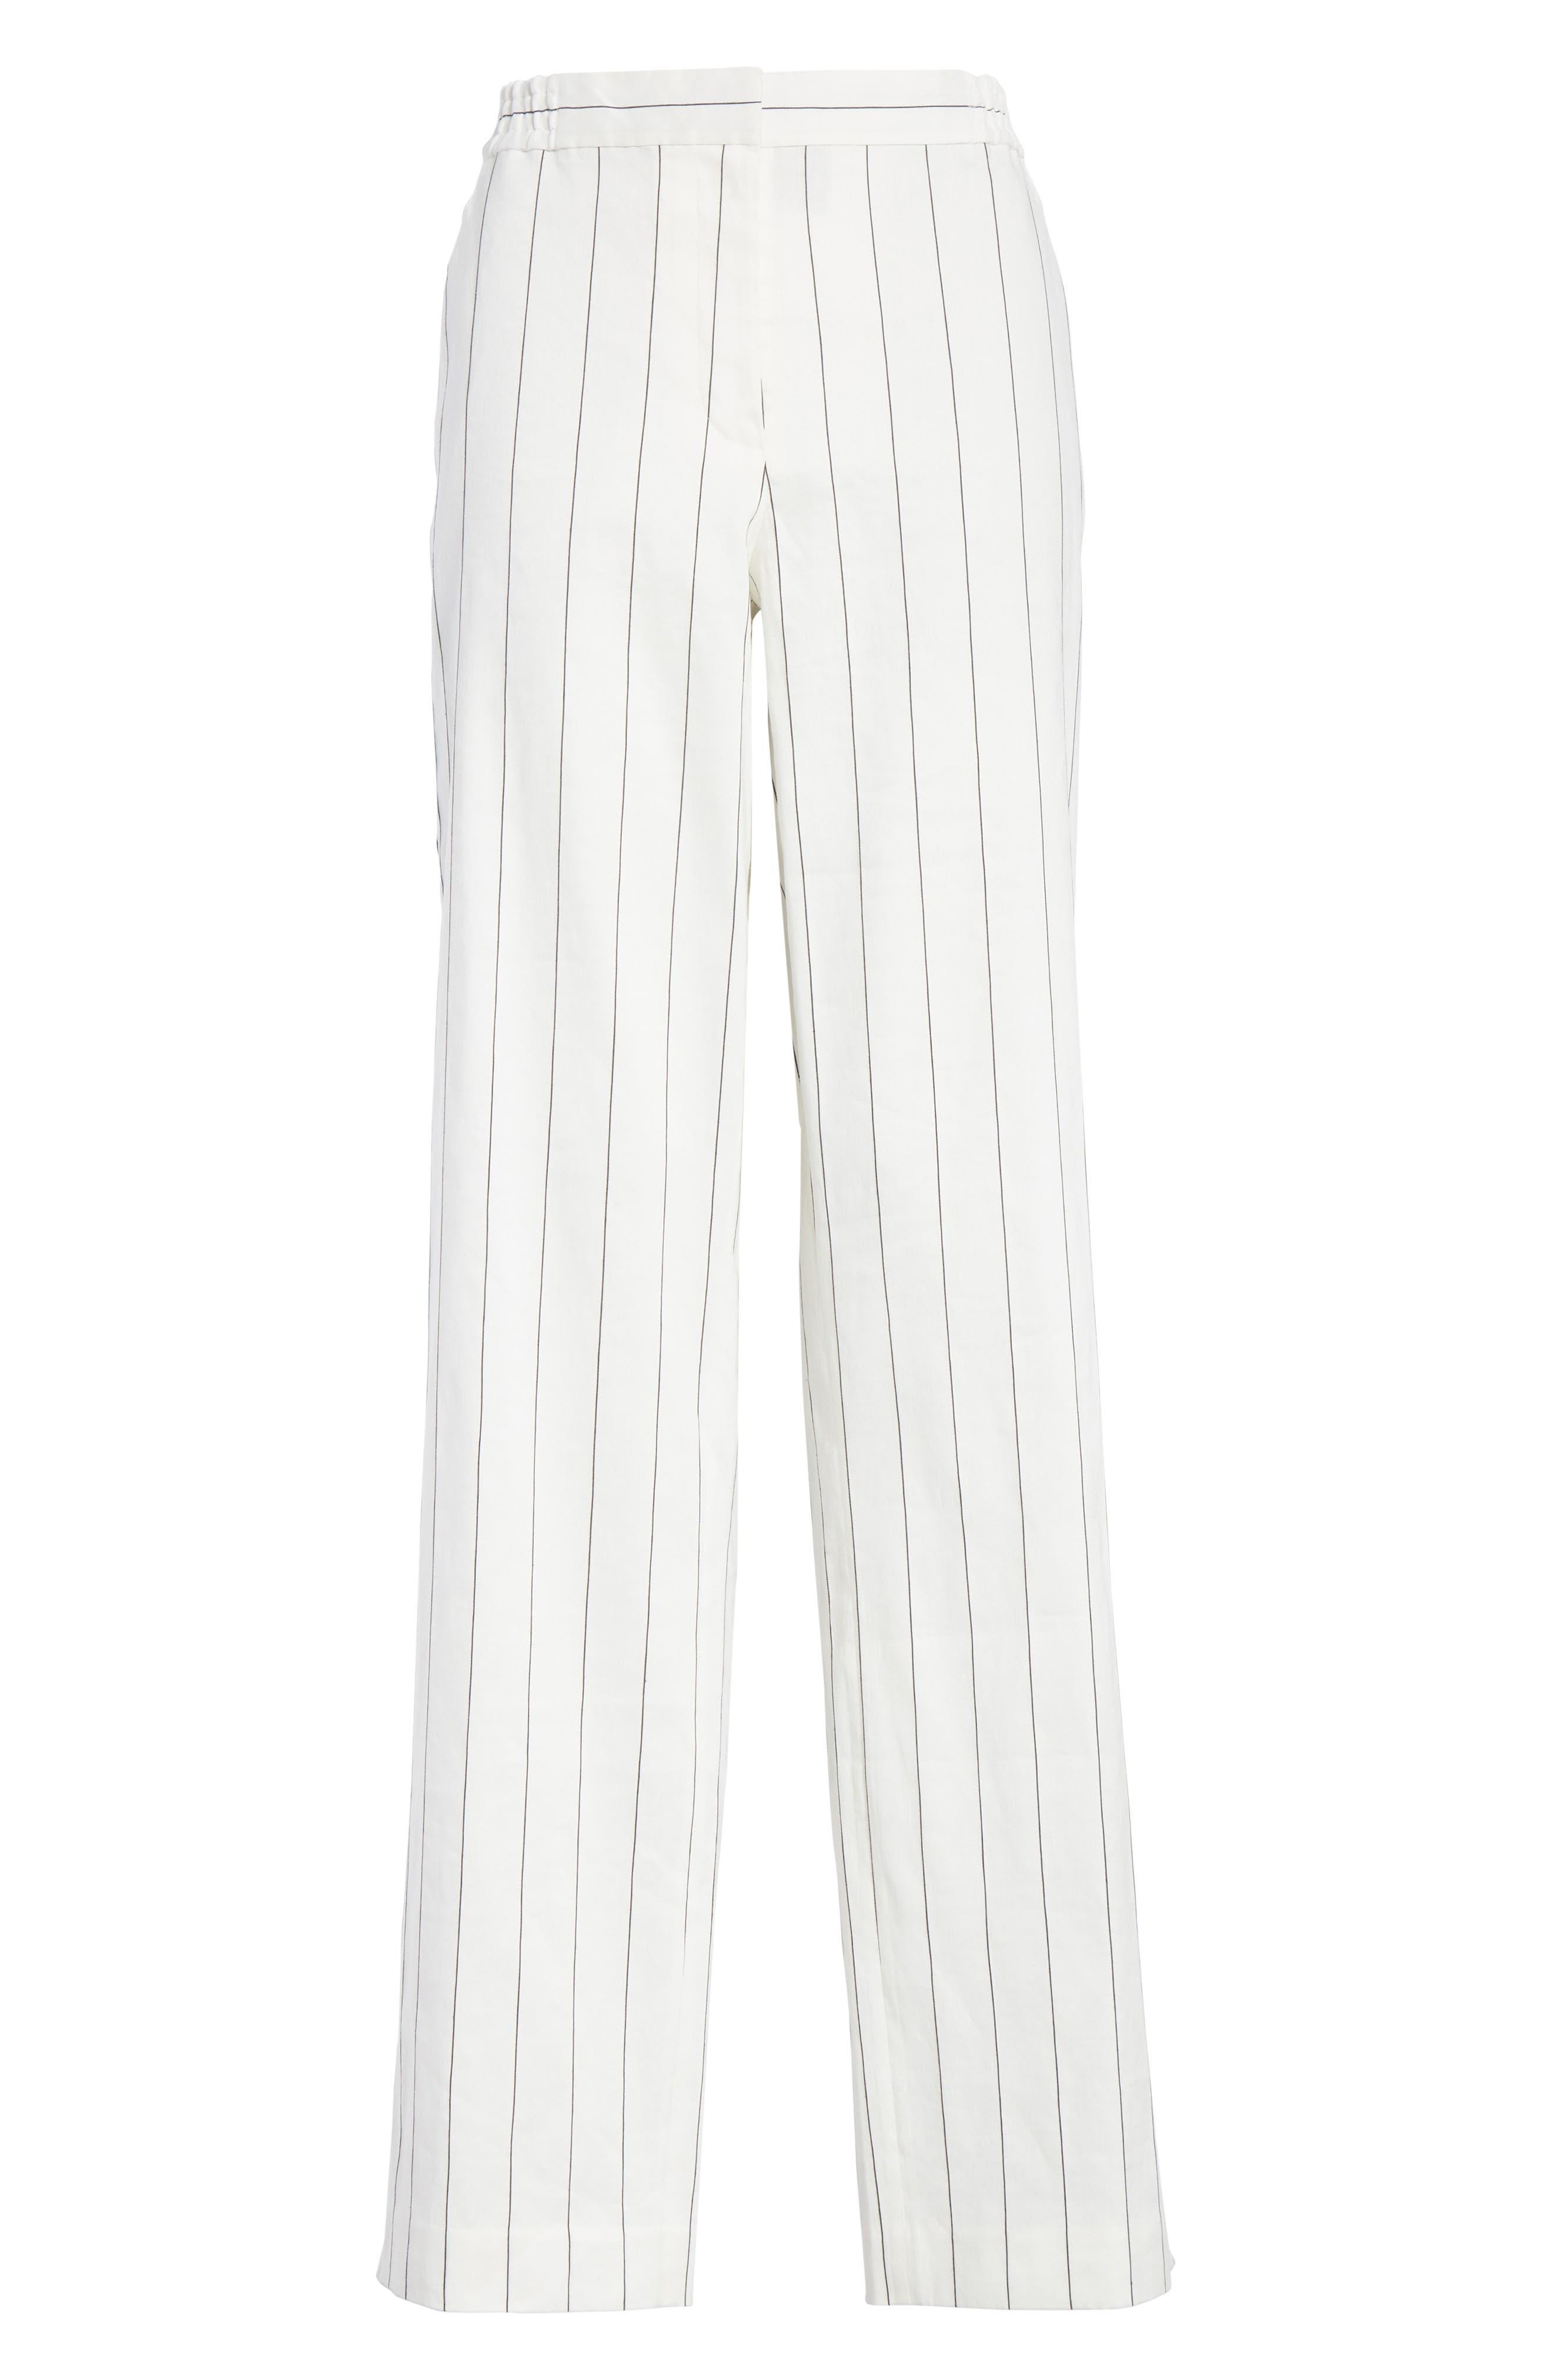 Snap Side Stripe Pants,                             Alternate thumbnail 6, color,                             907